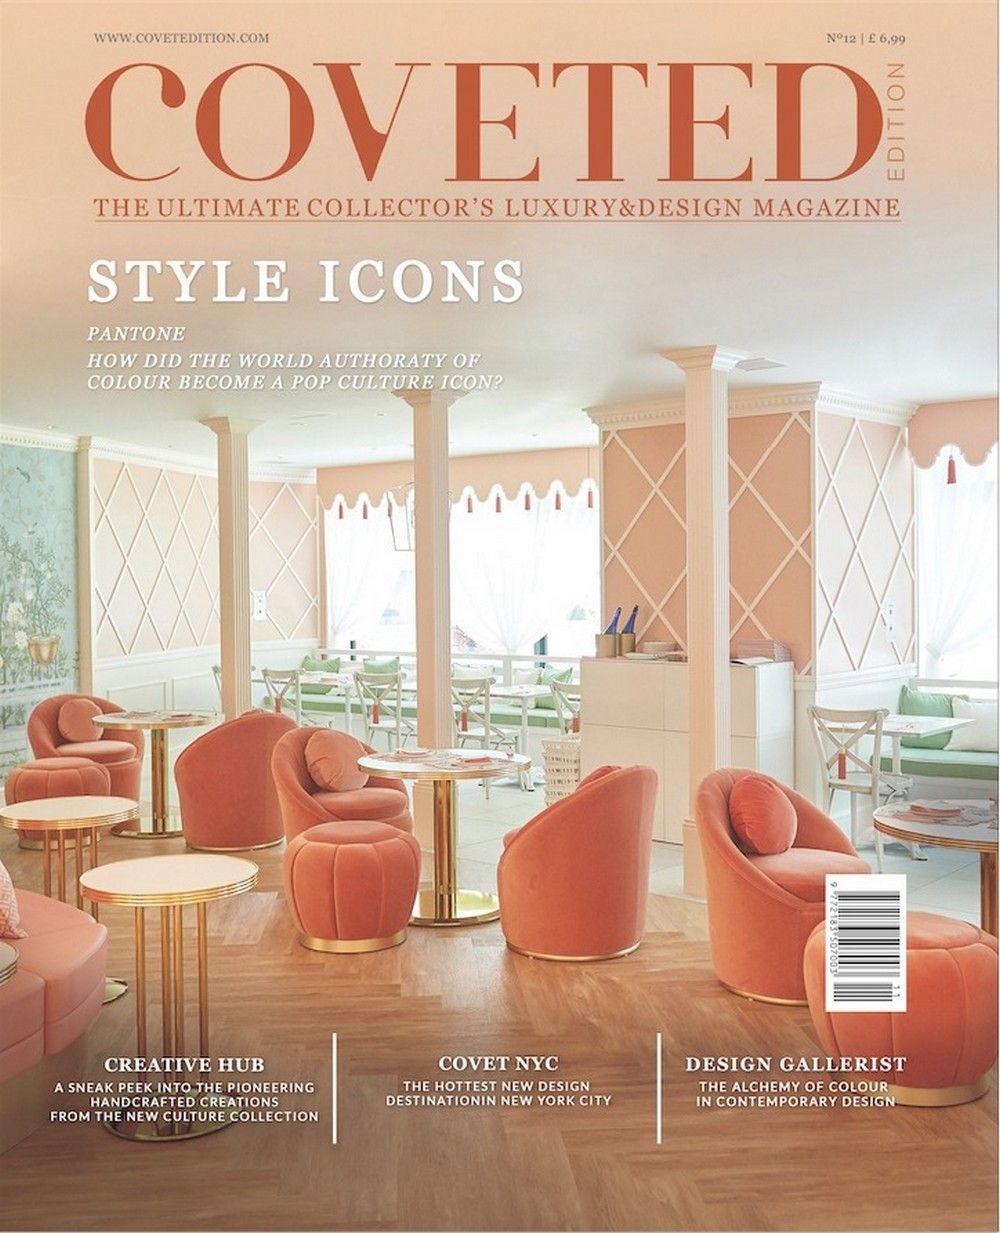 Top 15 Interior Design Magazines To Find In Maison Et Objet 2019 Interiordesign Interiordesignideas Inspir Interior Design Magazine Interior Design Interior